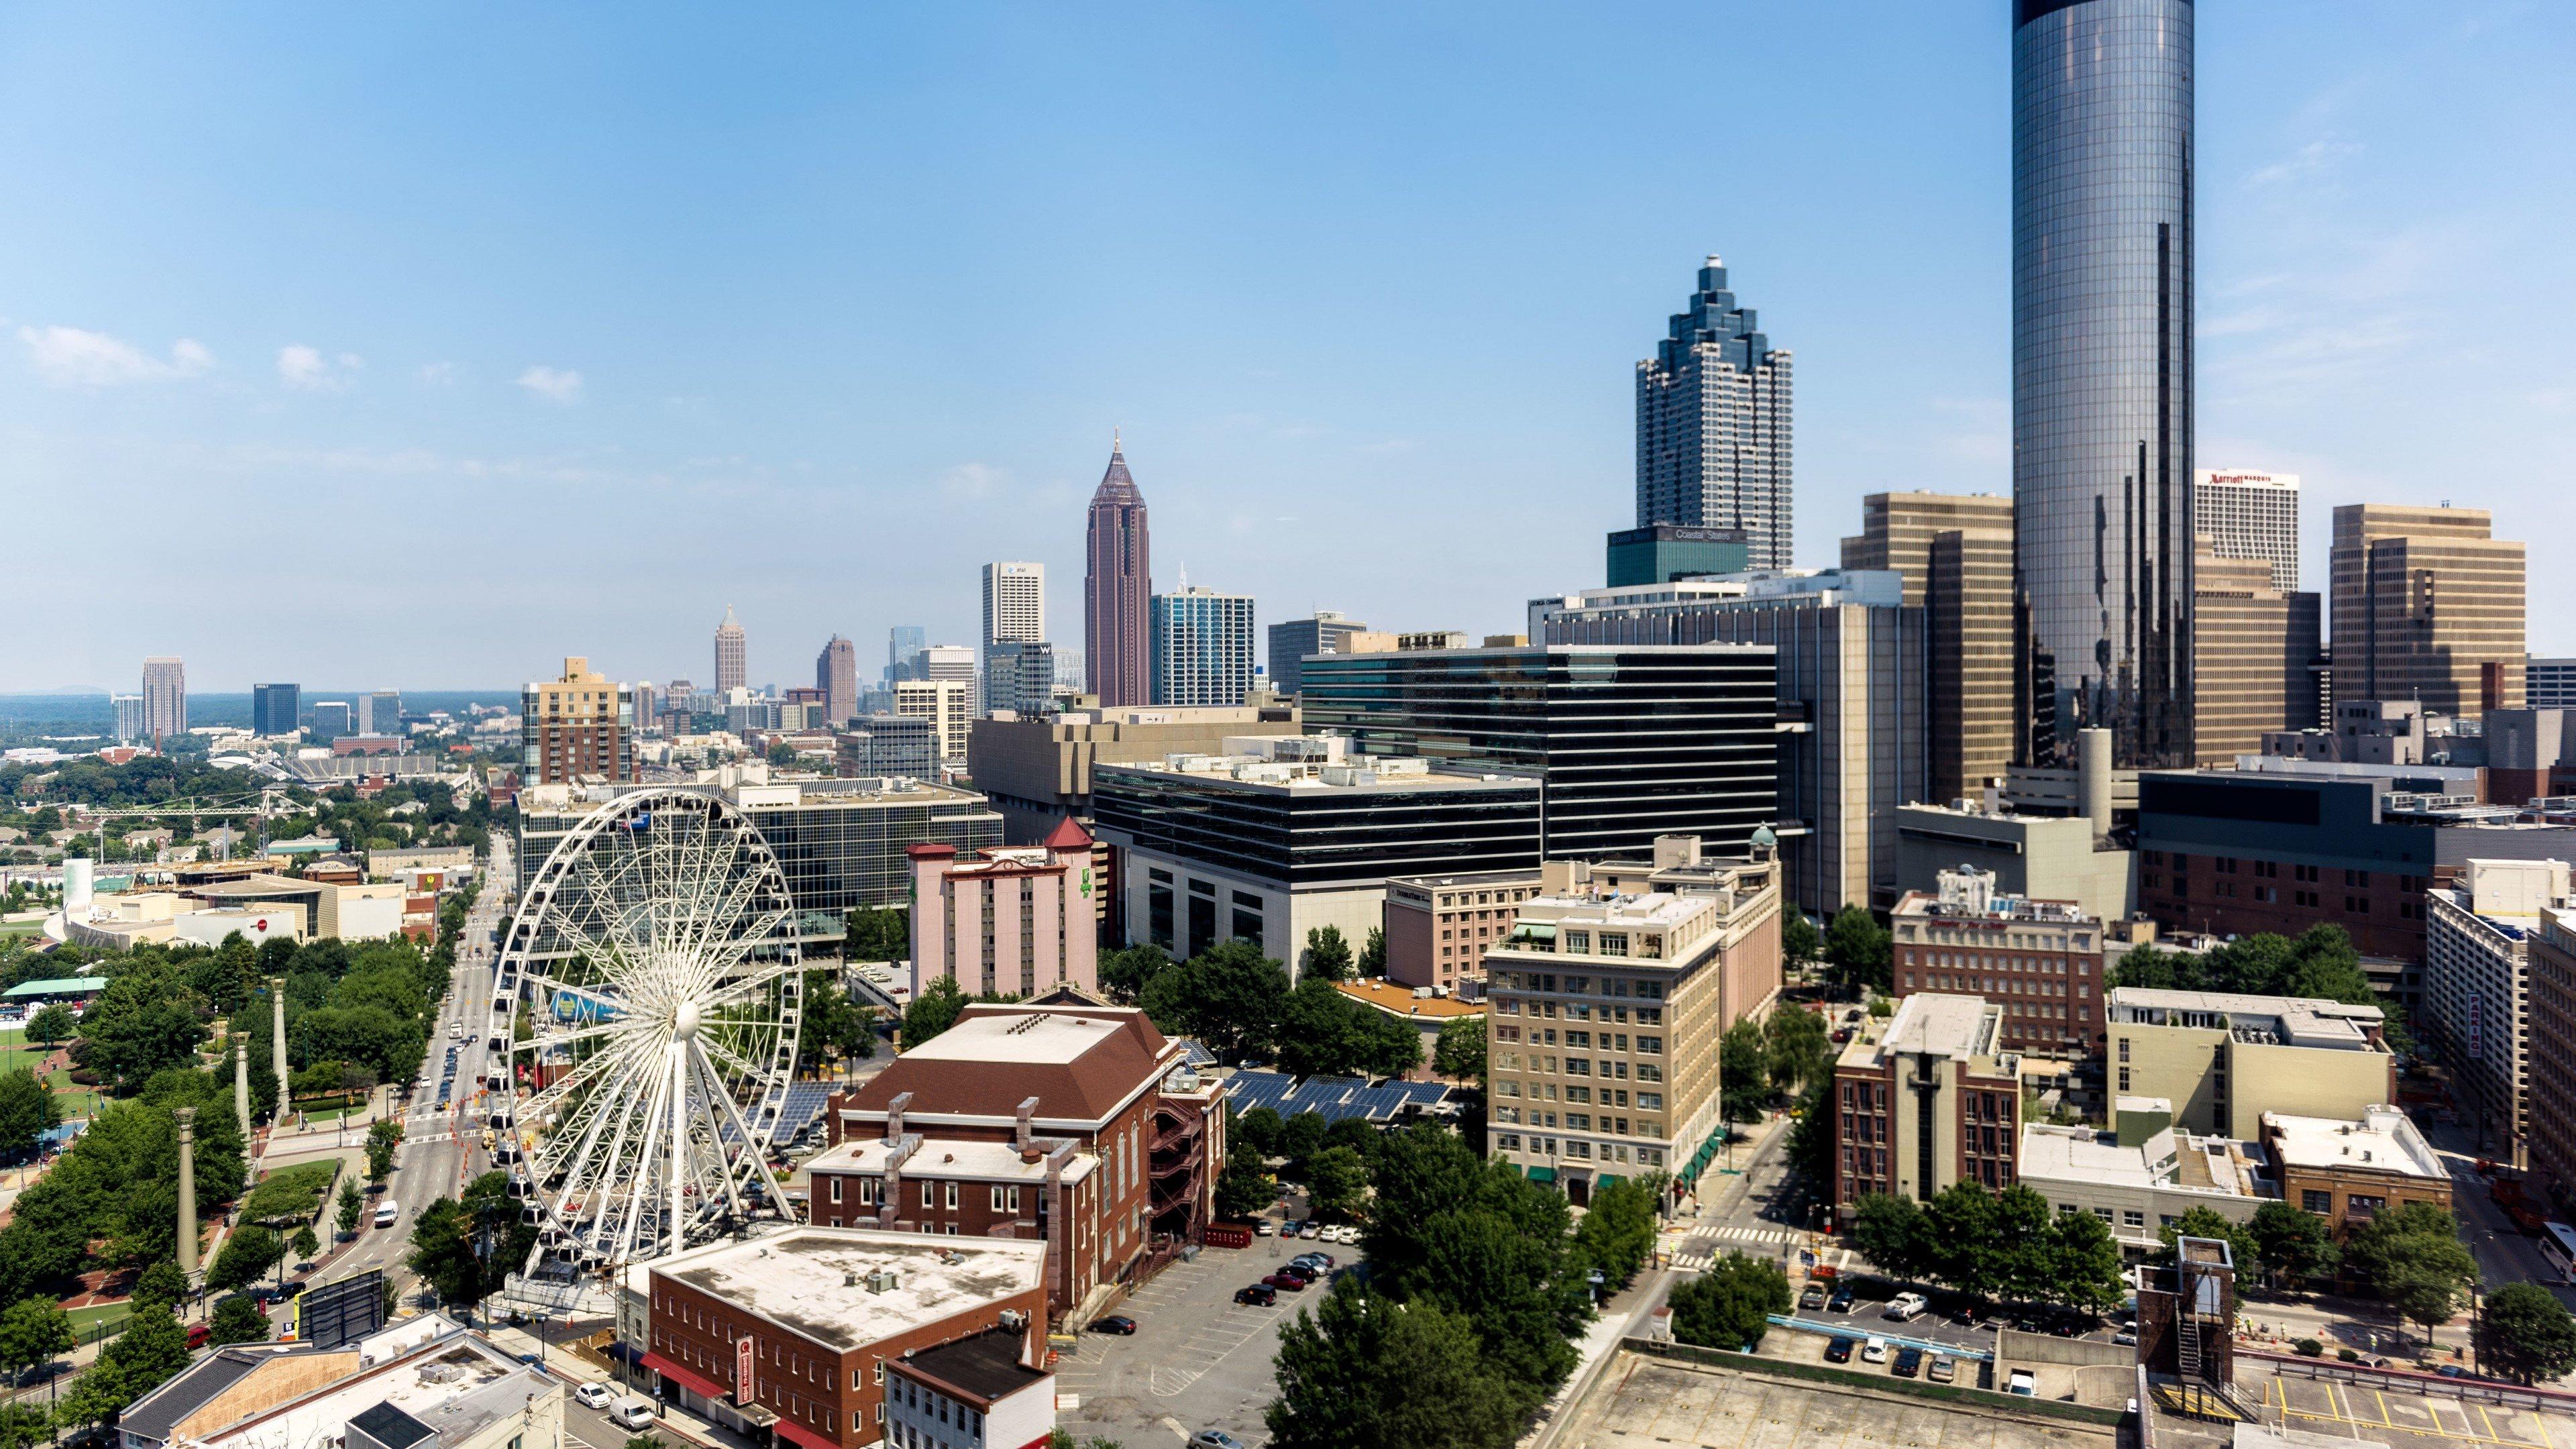 Fondos de pantalla Rascacielos en Atlanta Georgia